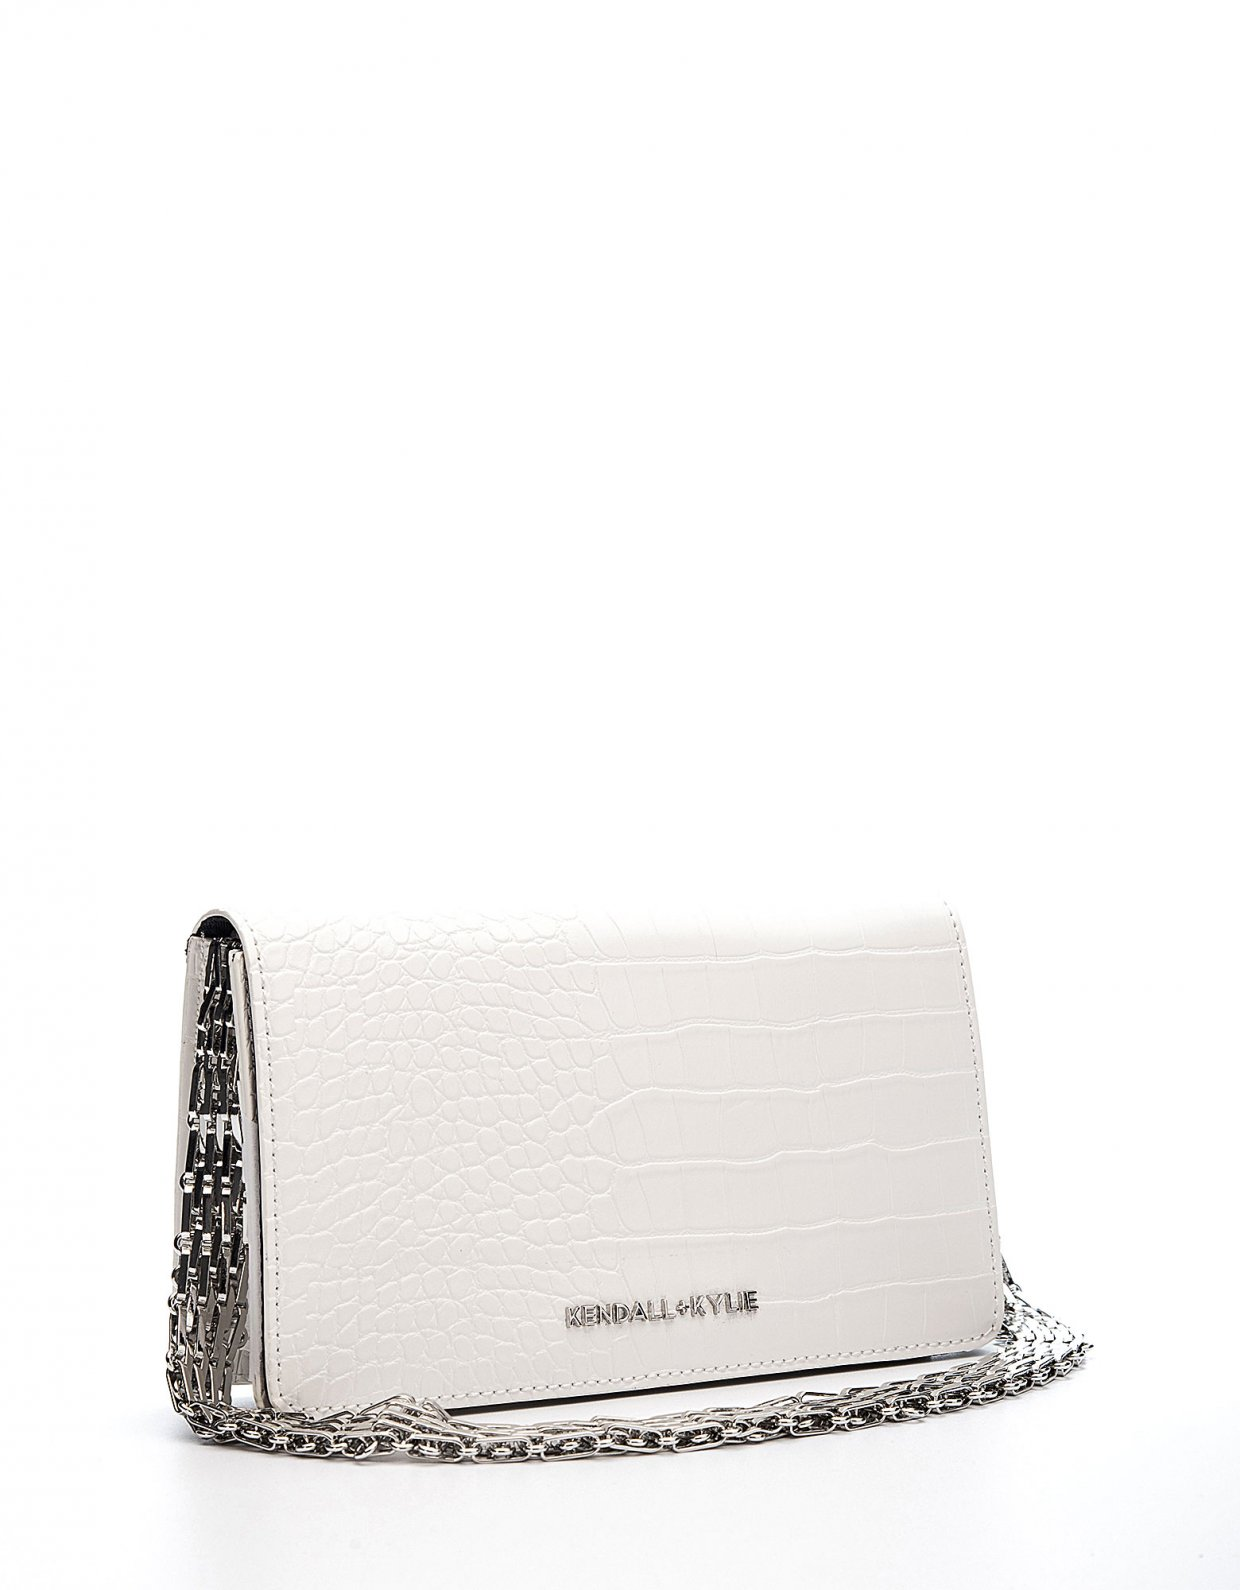 Kendall + Kylie Amanza shoulder bag white croco